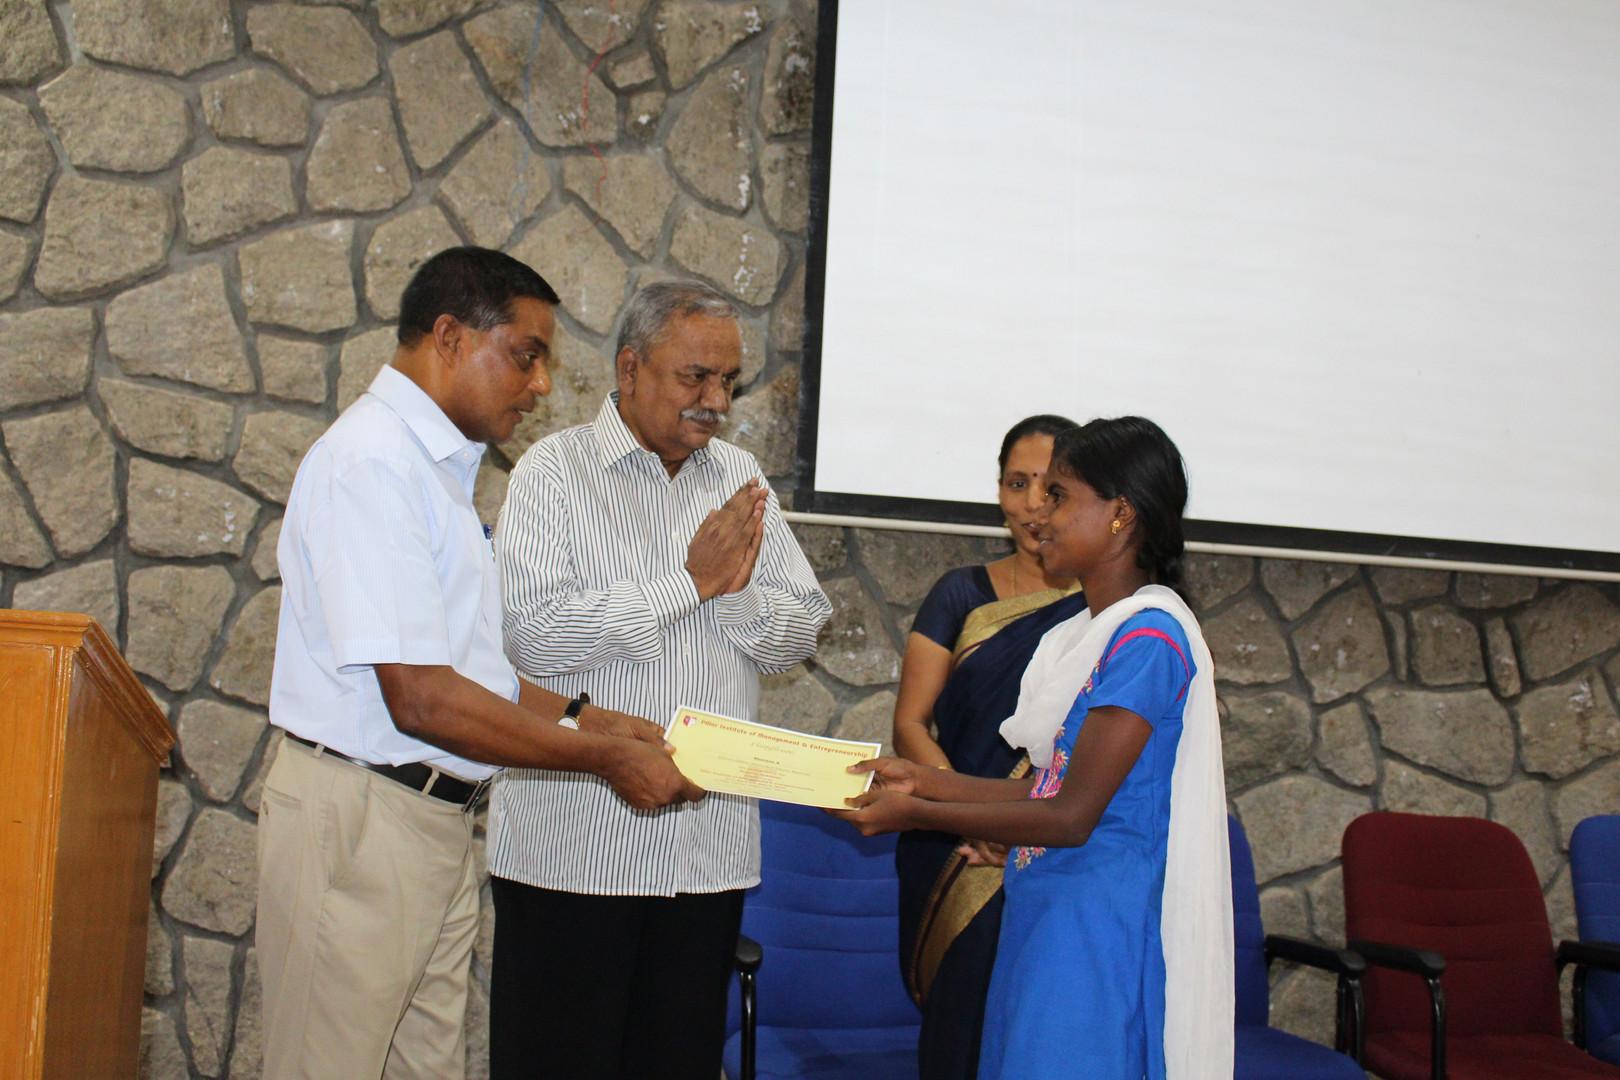 receiving a certificate